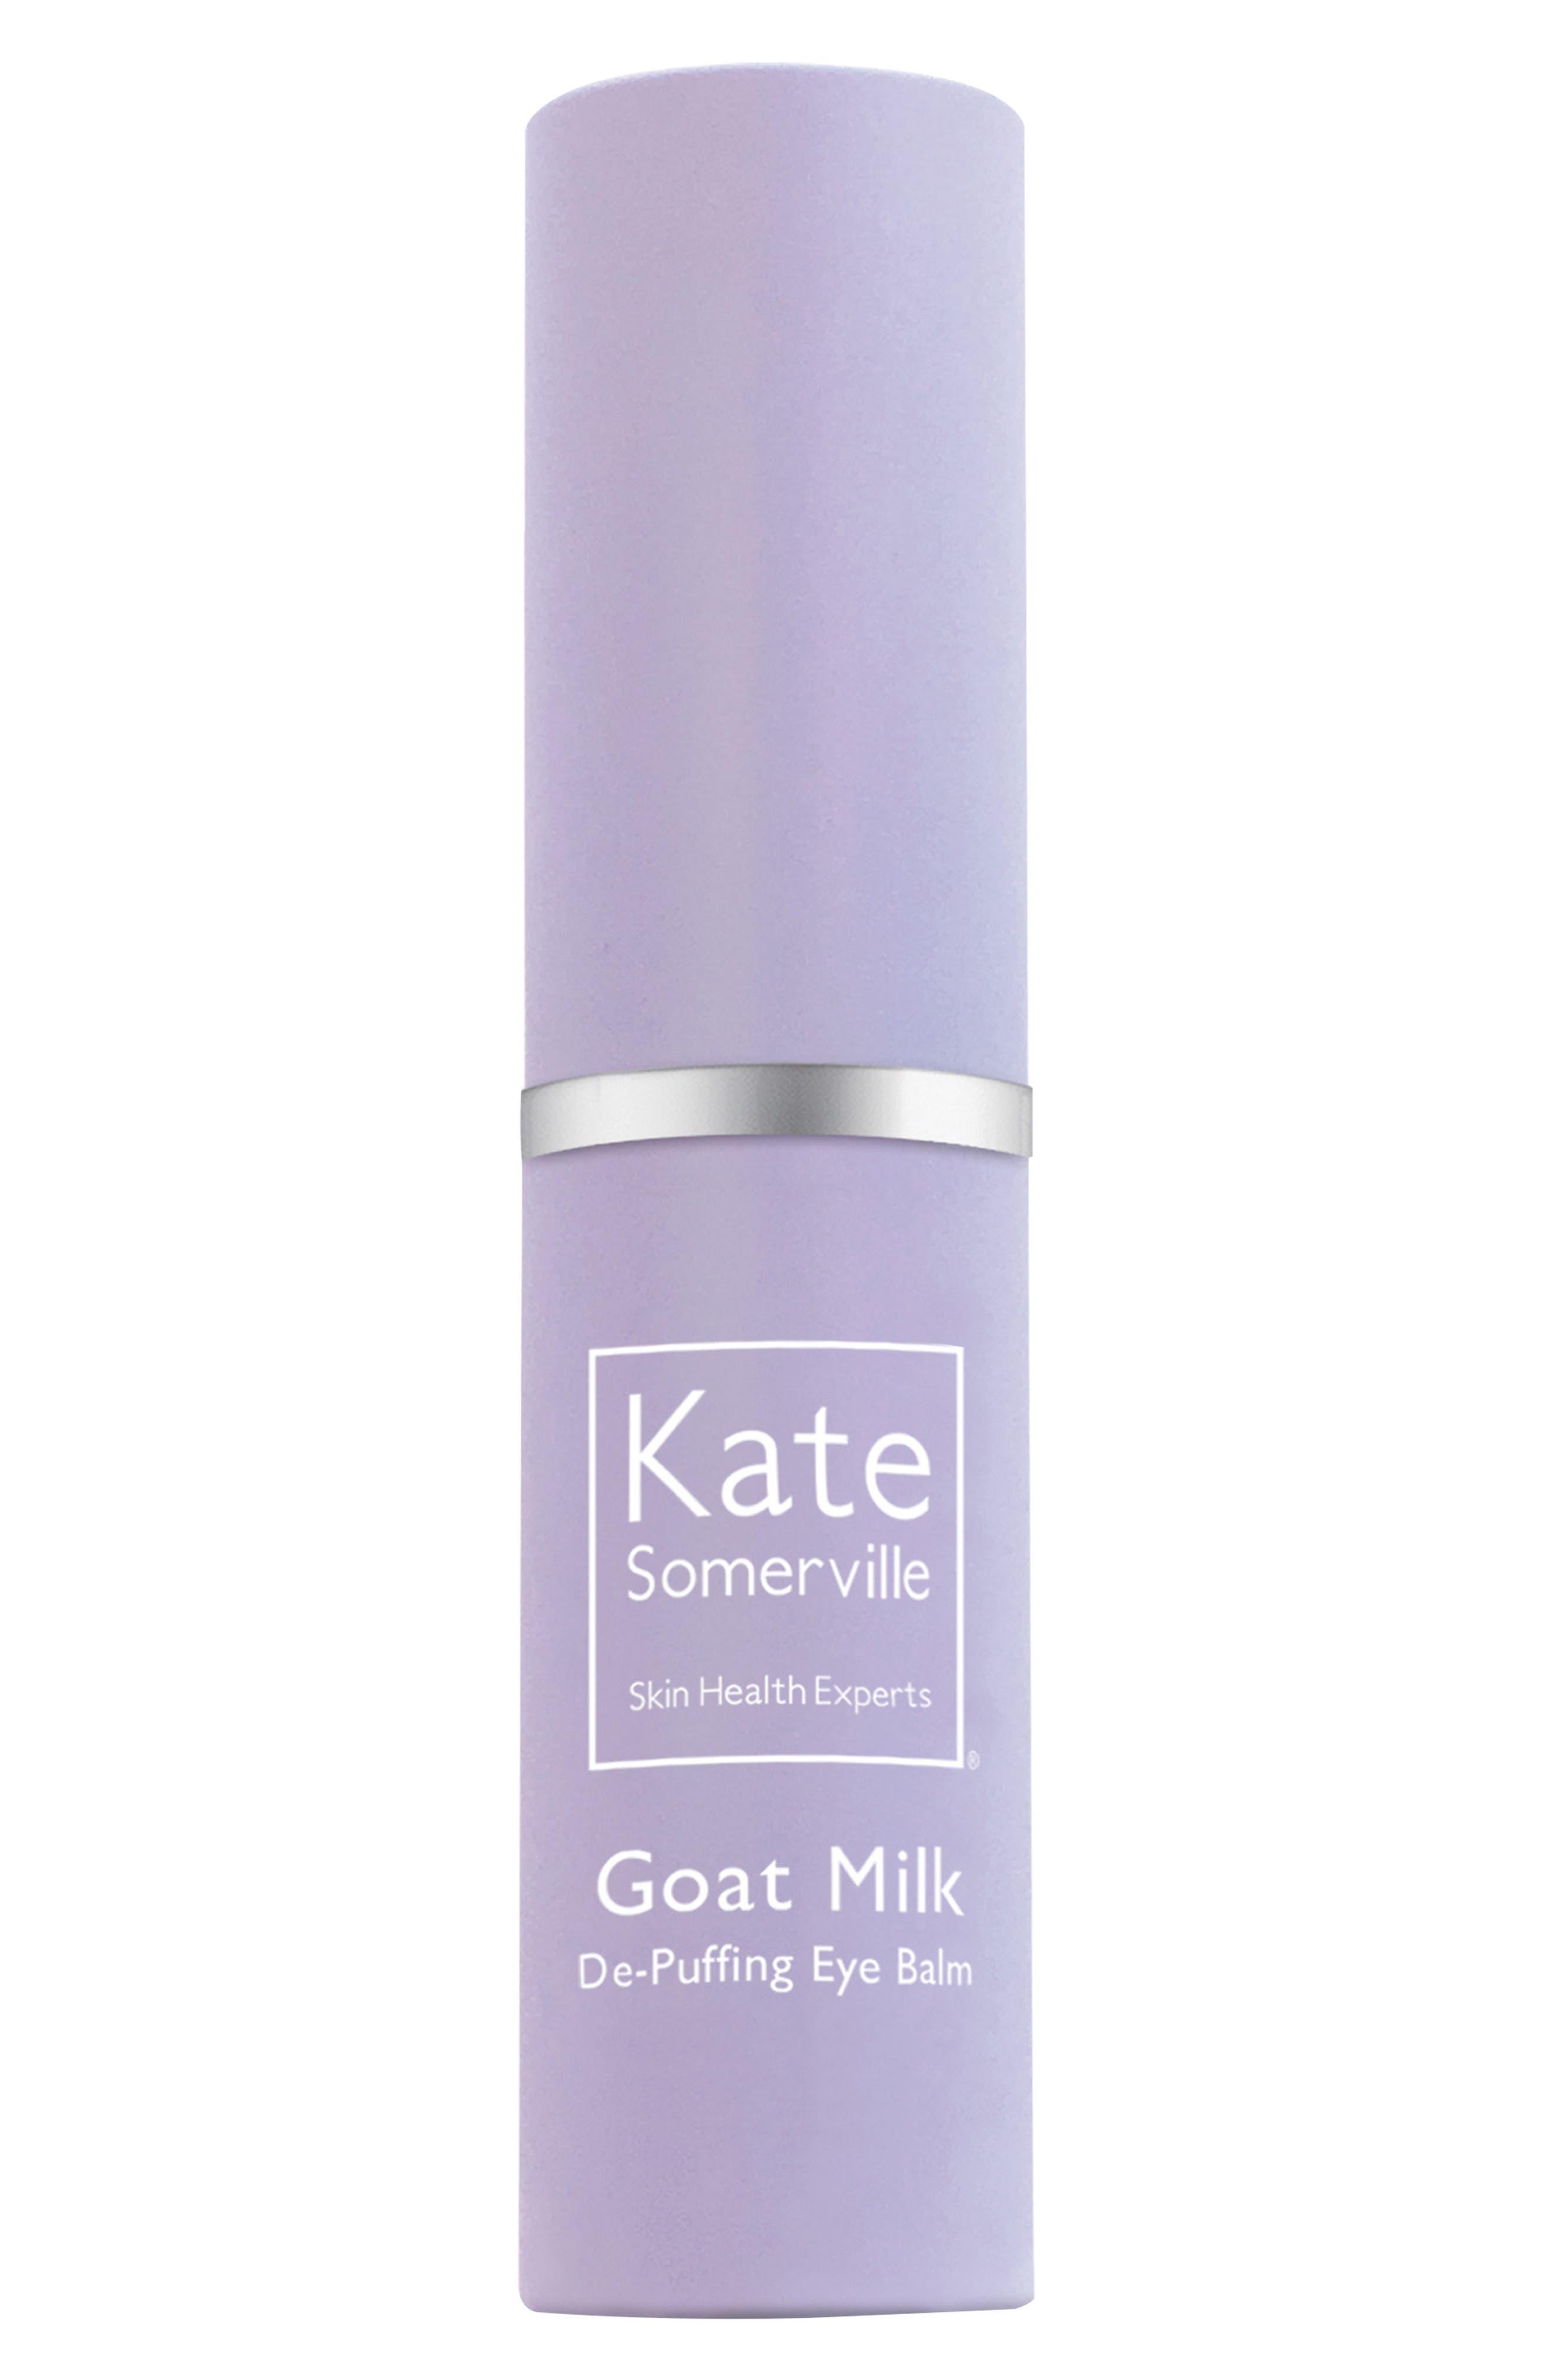 Kate Somerville® Goat Milk De-Puffing Eye Balm